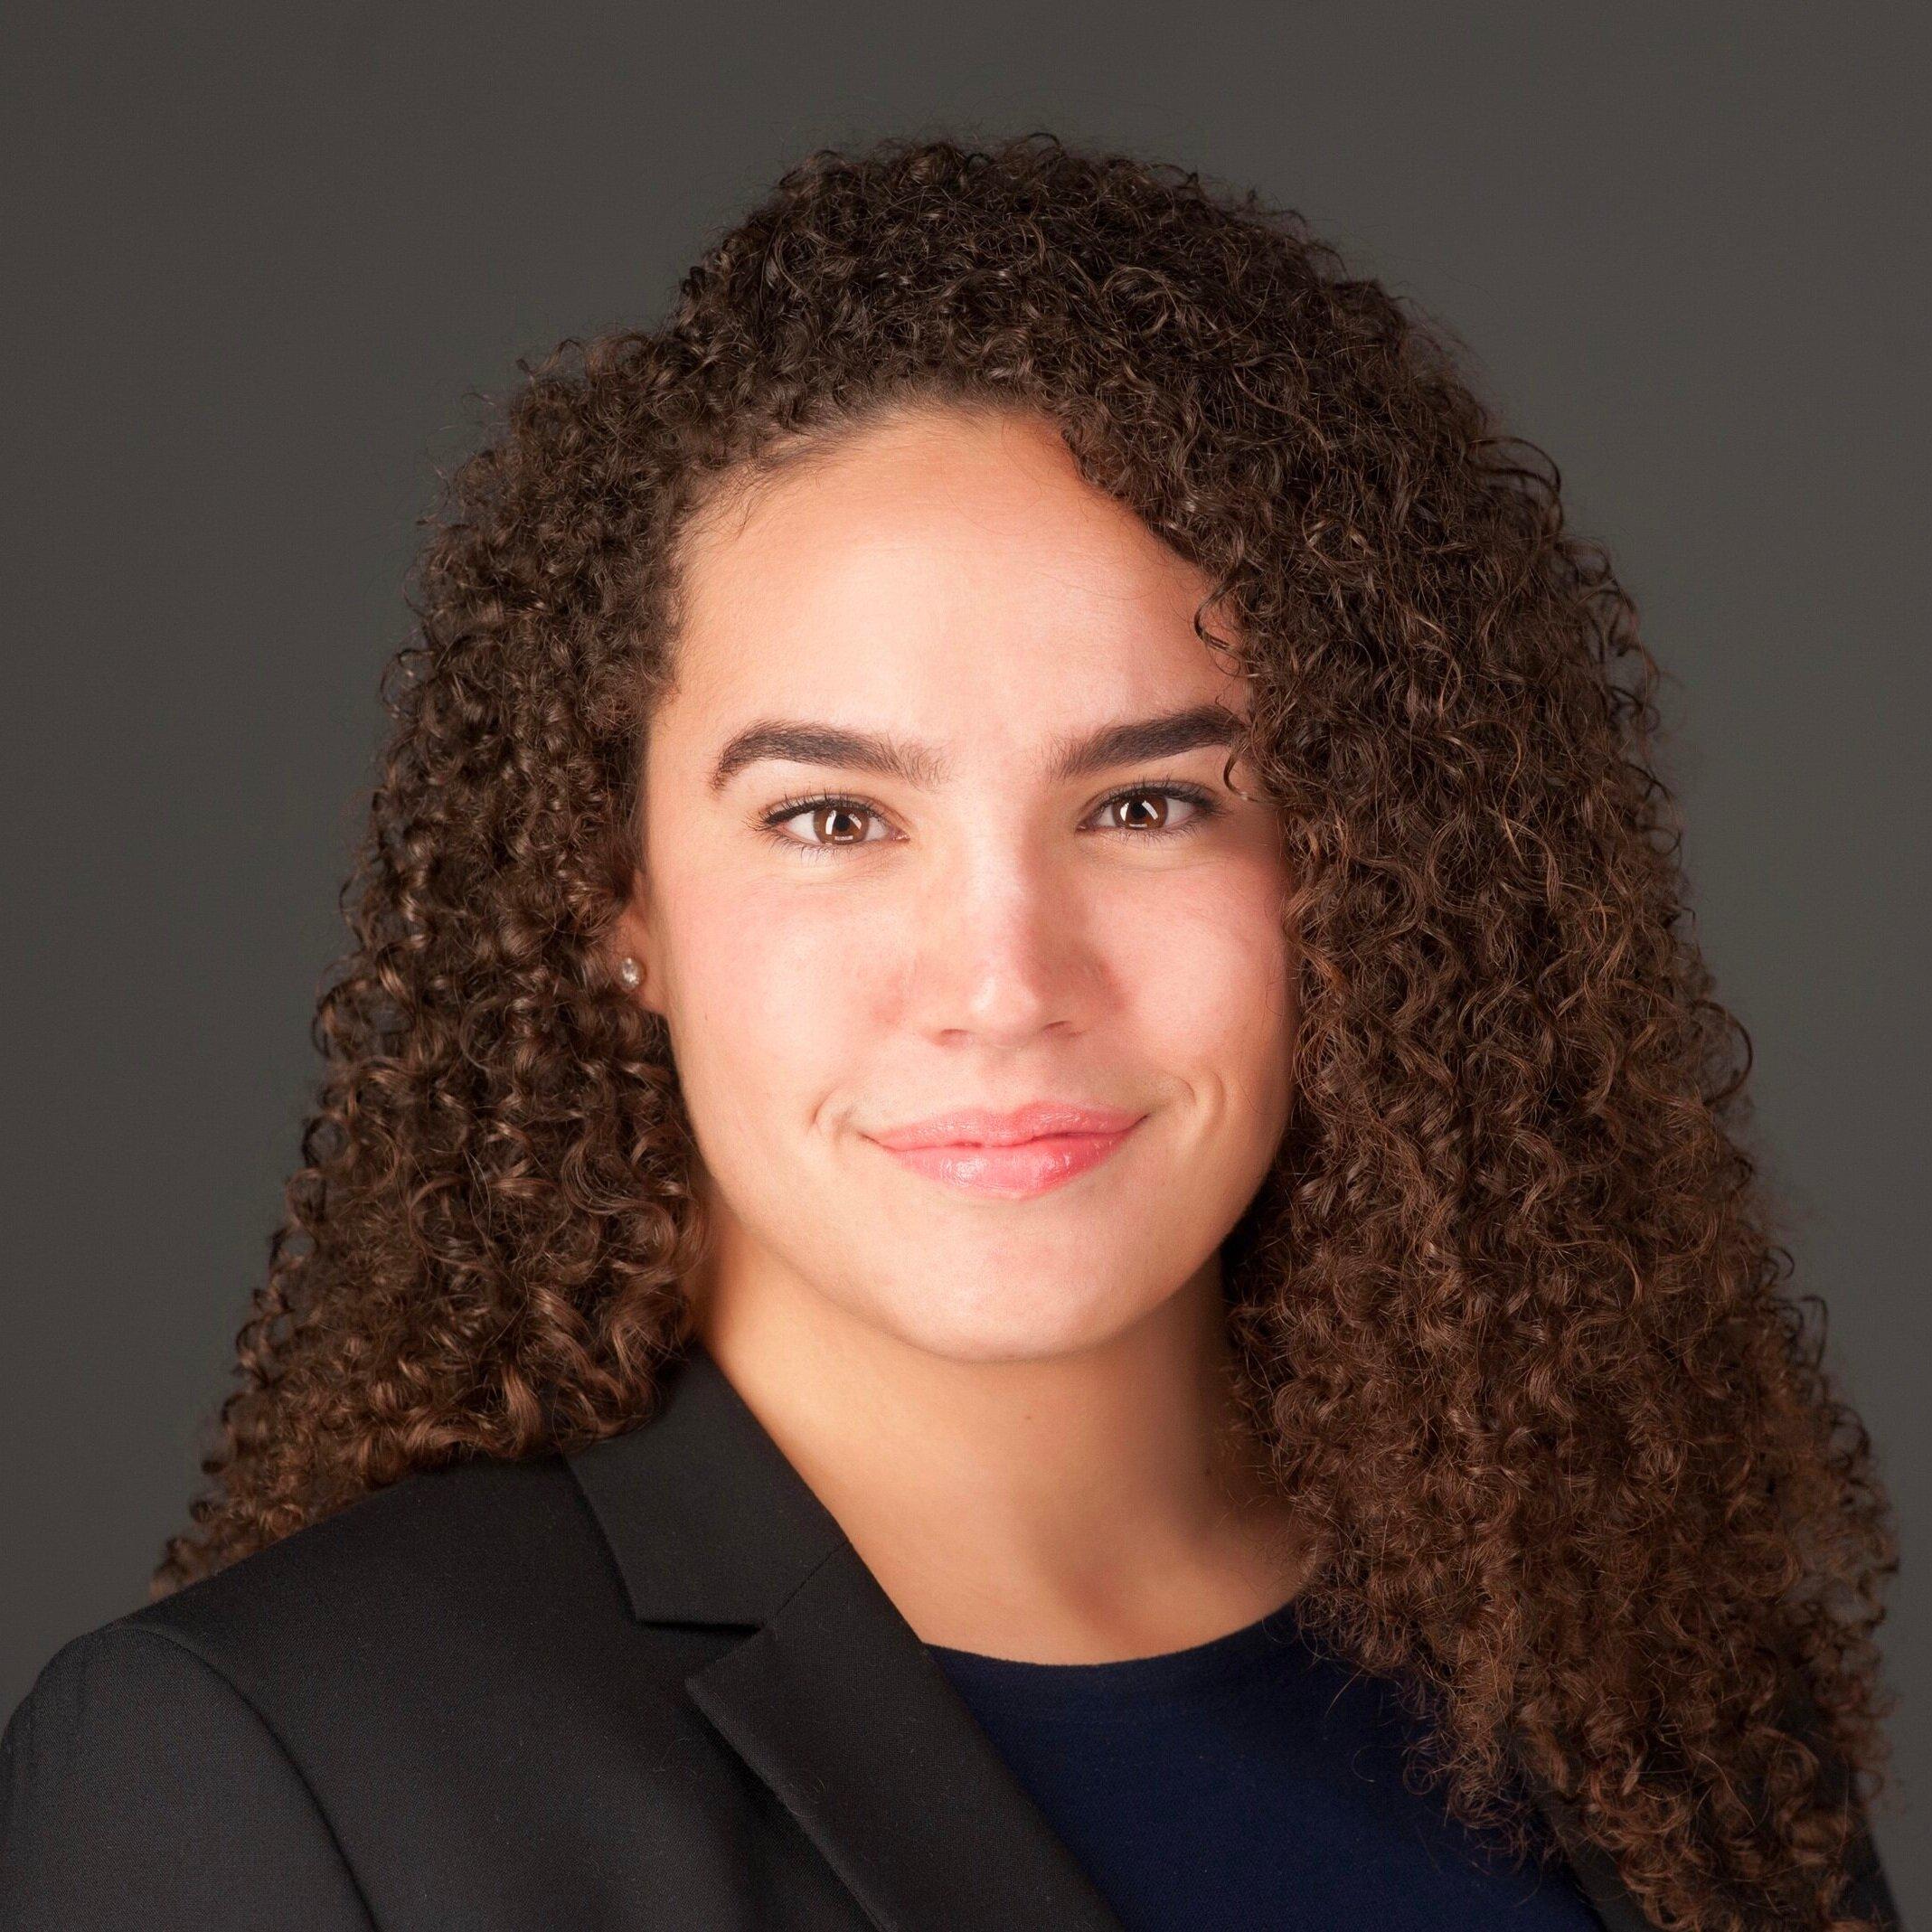 Caroline Hymel, Senior Account Executive